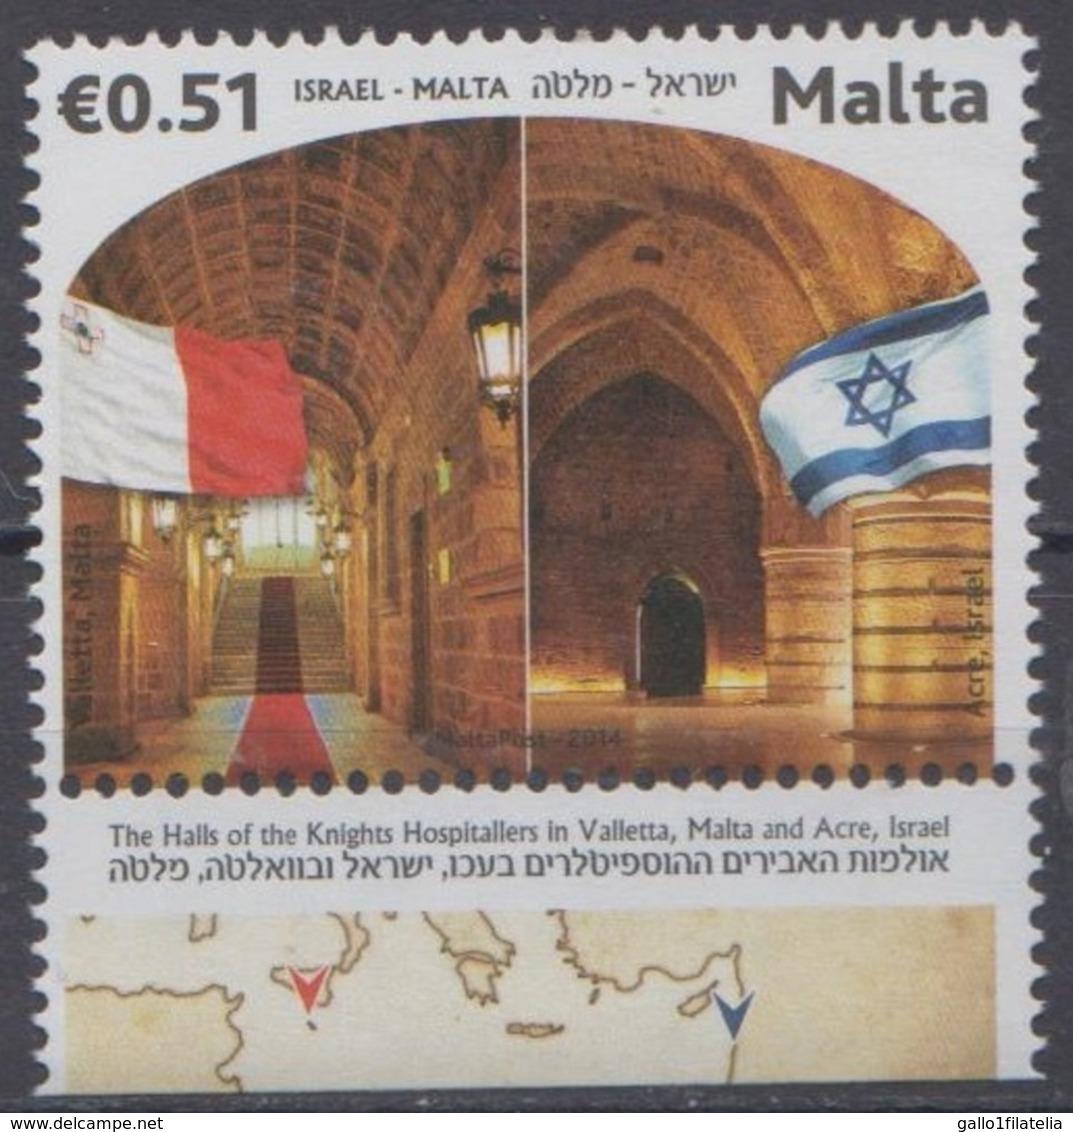 2014 - MALTA - RELAZIONI DIPLOMATICHE CON ISRAELE / DIPLOMATIC RELATIONS WITH ISRAEL - JOINT ISSUE. MNH. - Emissioni Congiunte